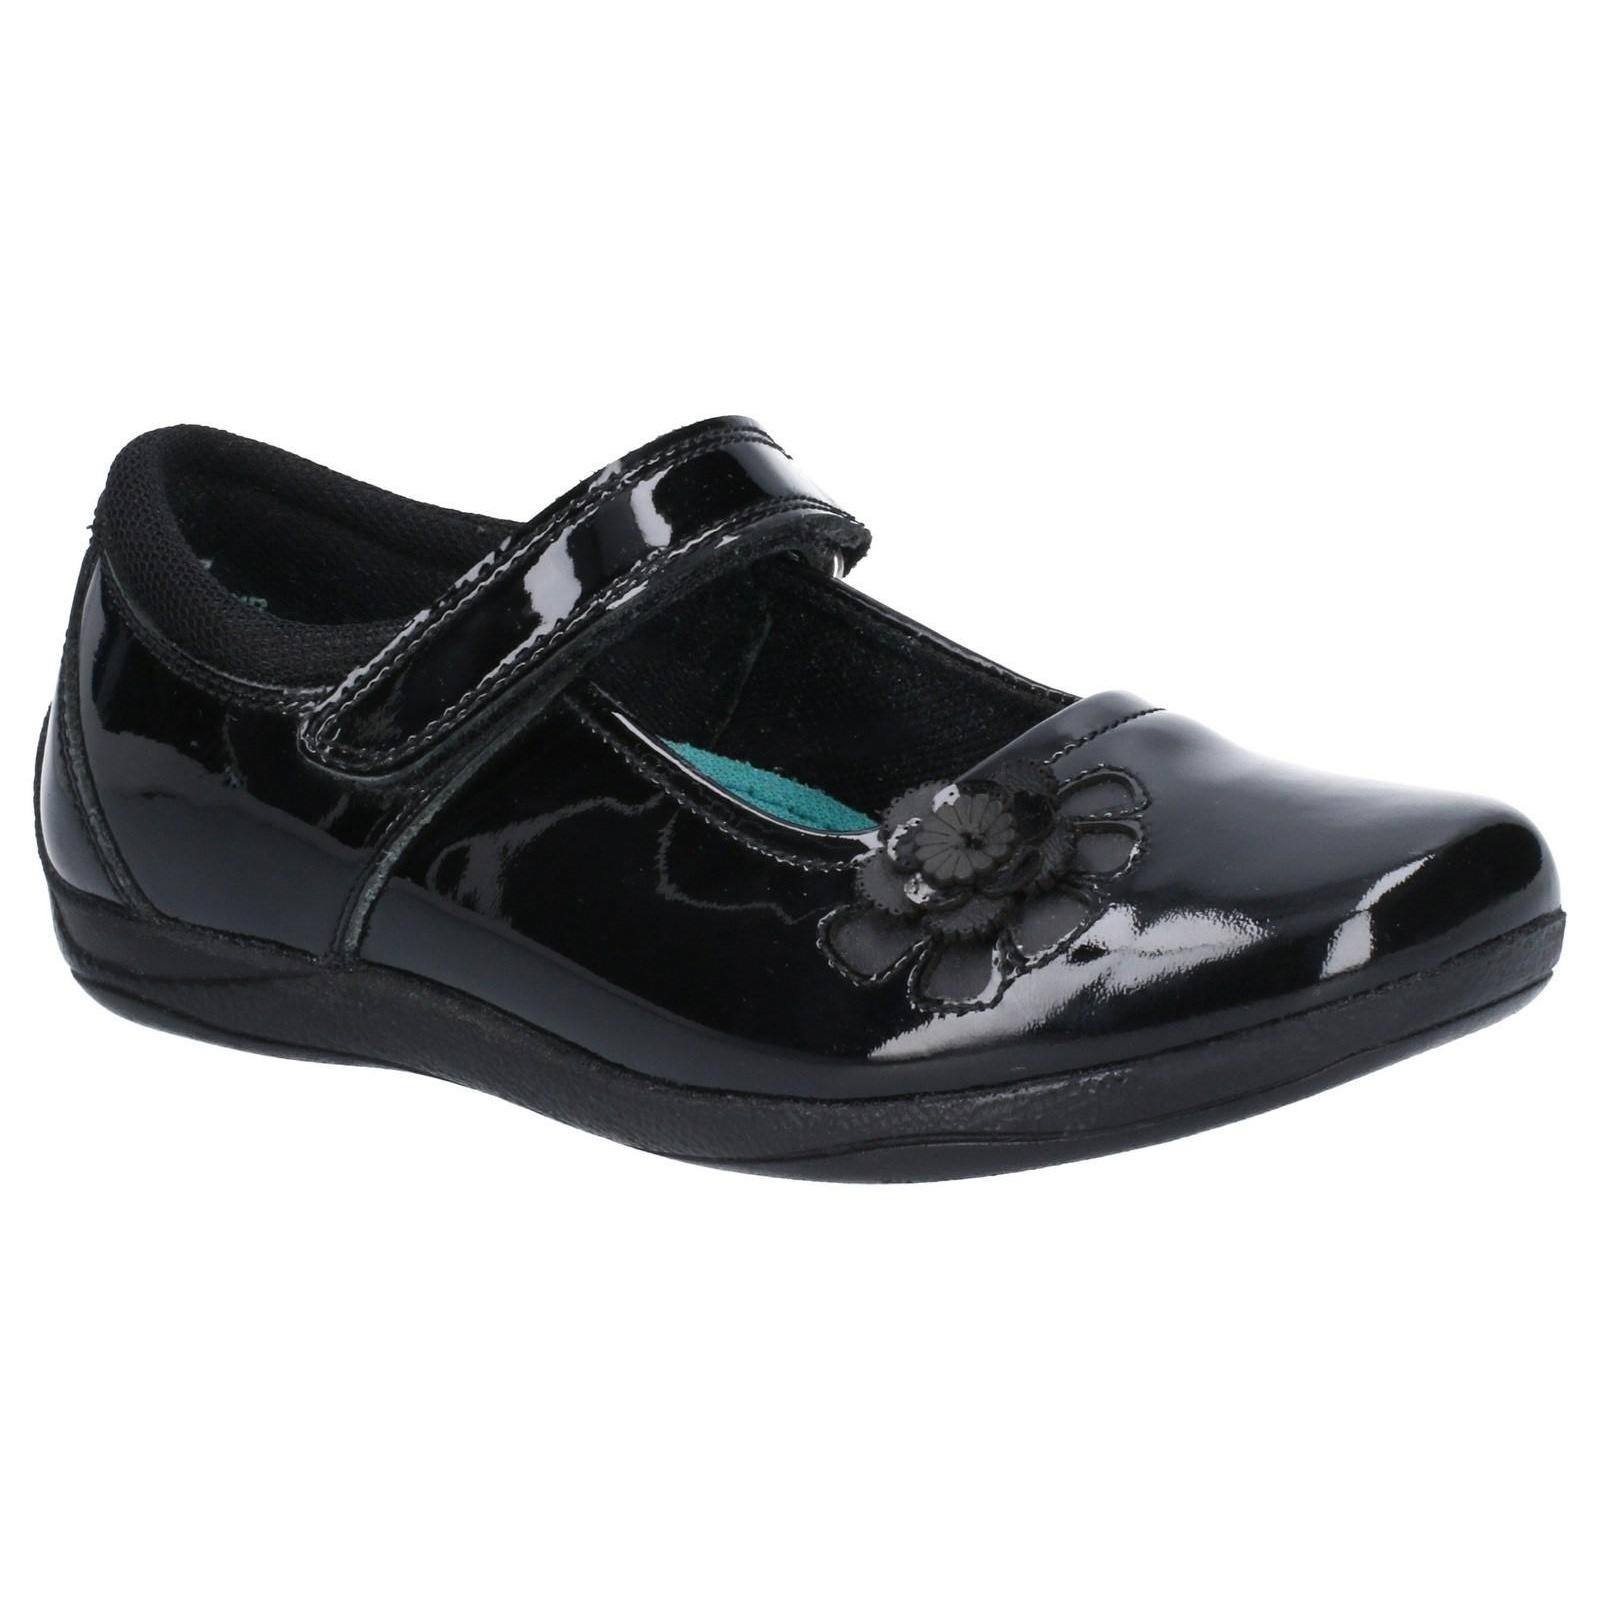 Hush Puppies Girls Jessica Patent Leather School Shoe (4.5 UK Child) (Black Patent)